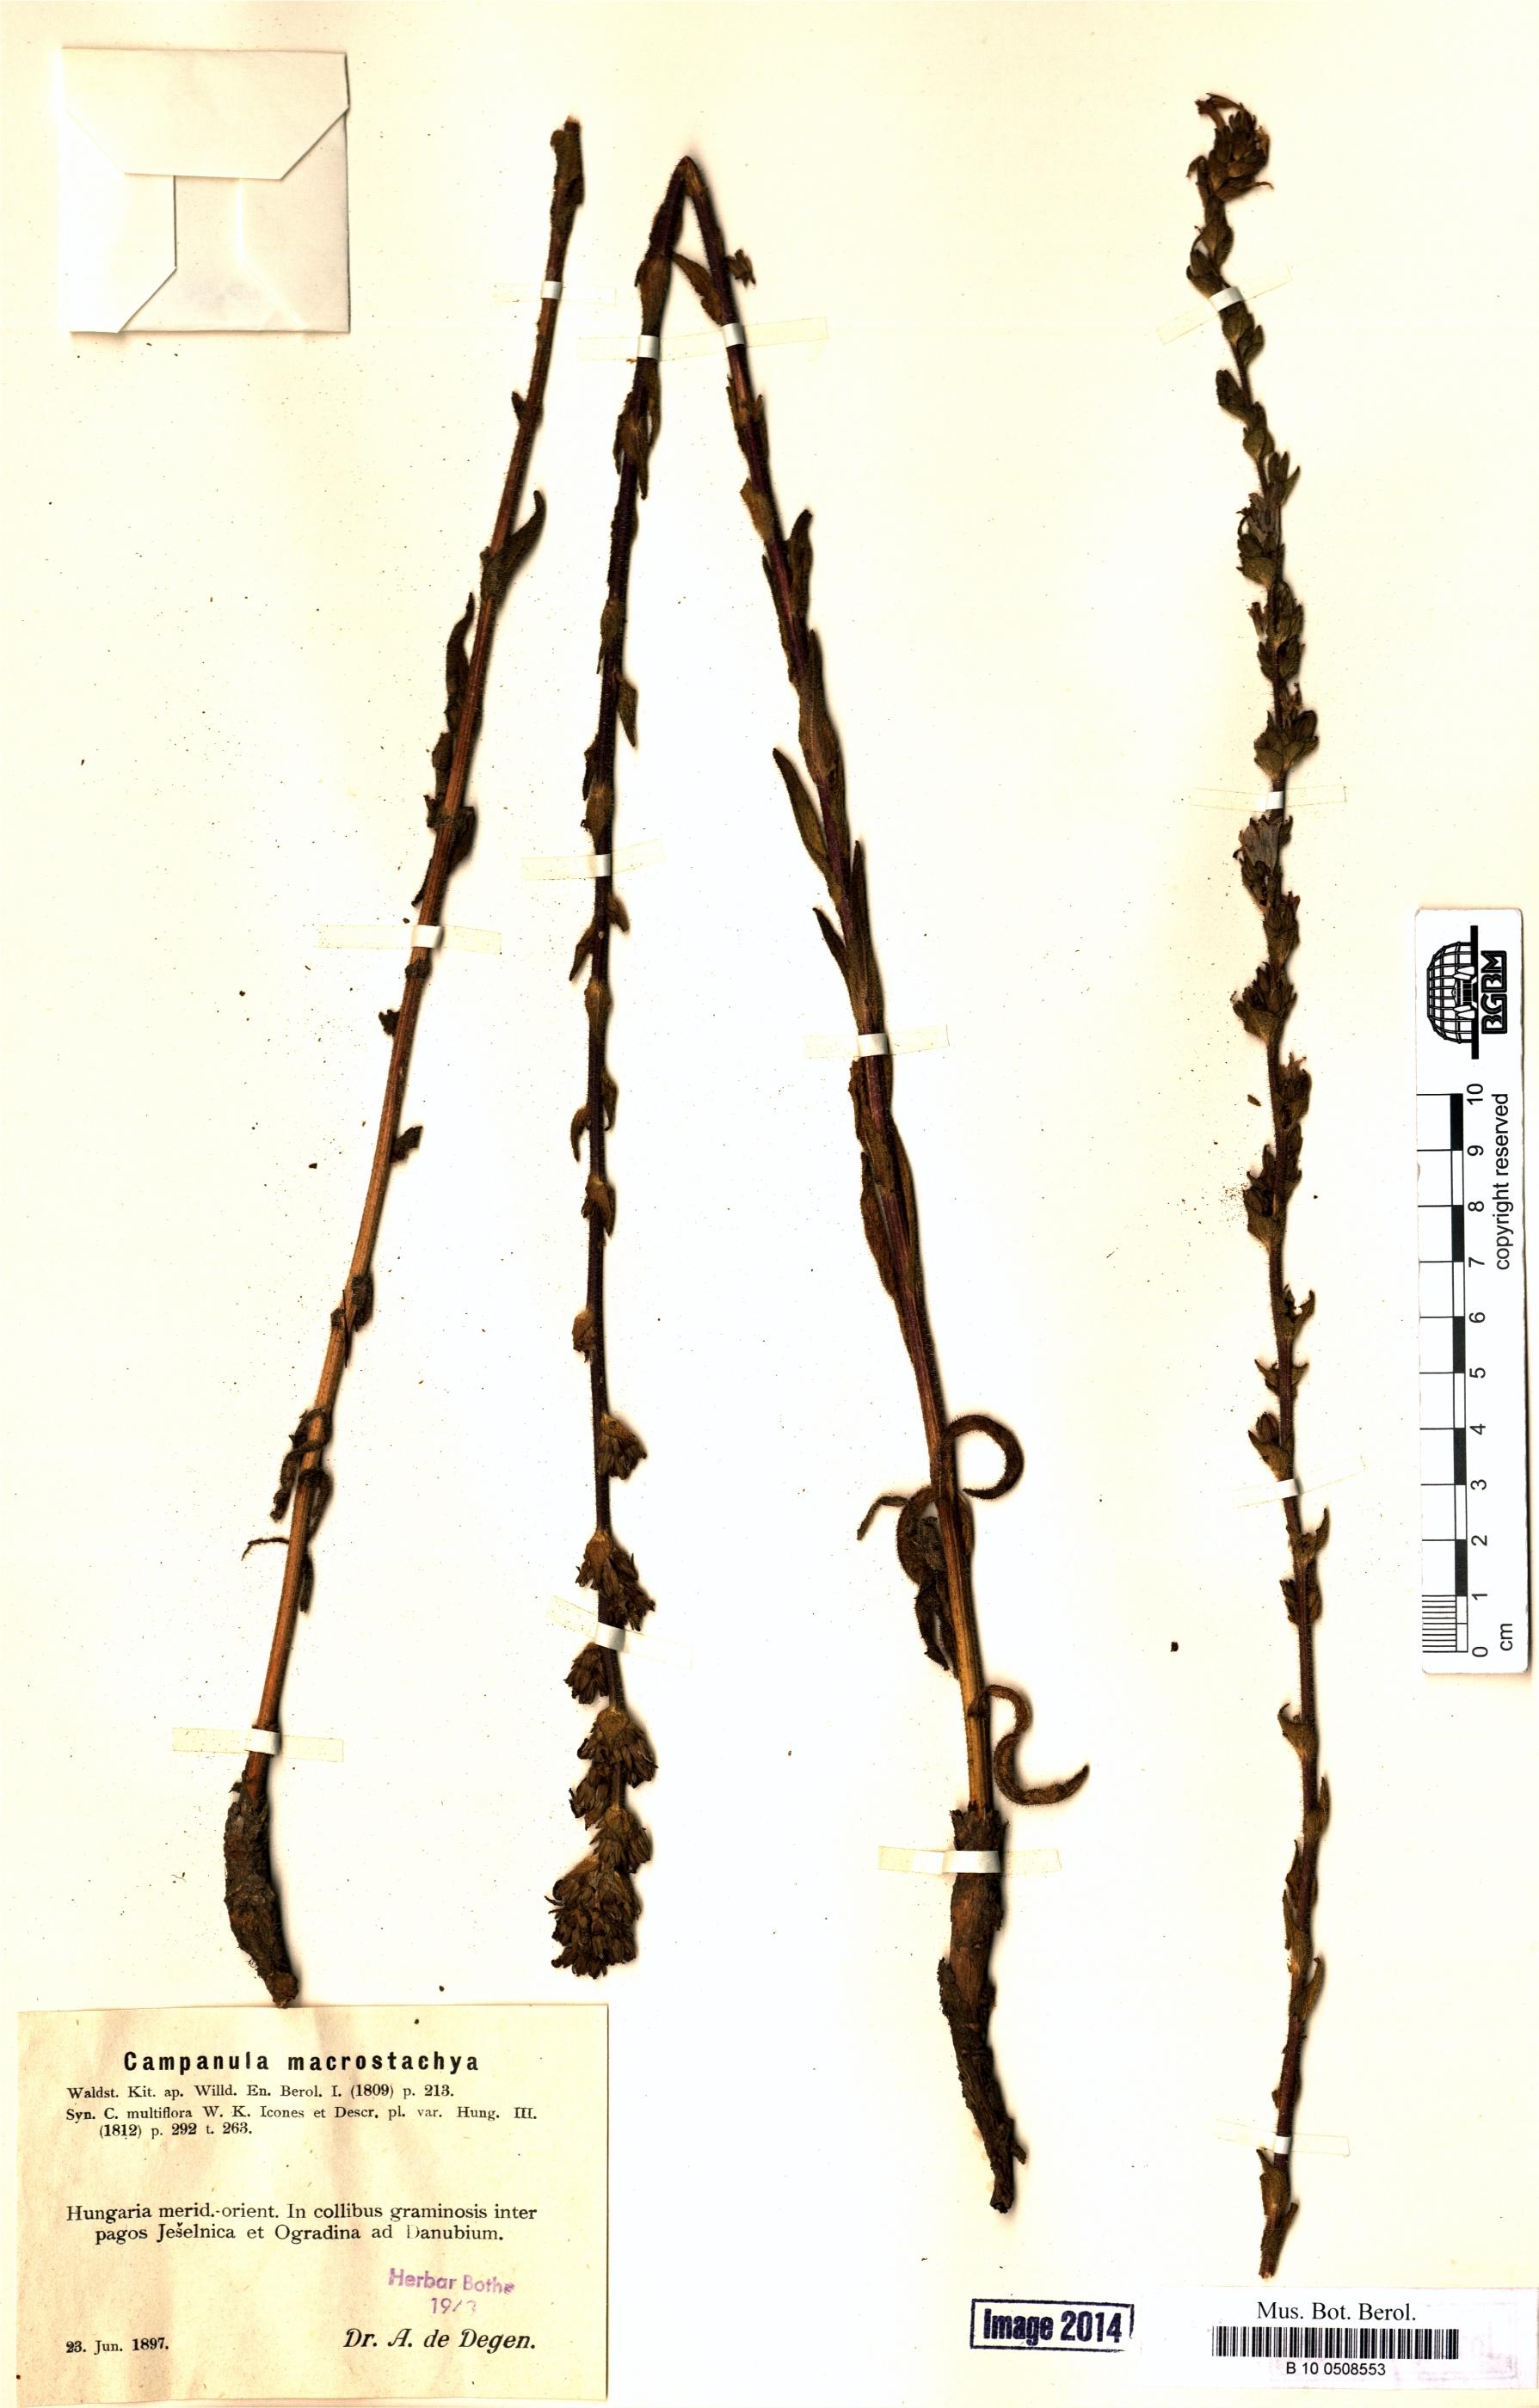 http://ww2.bgbm.org/herbarium/images/B/10/05/08/55/B_10_0508553.jpg